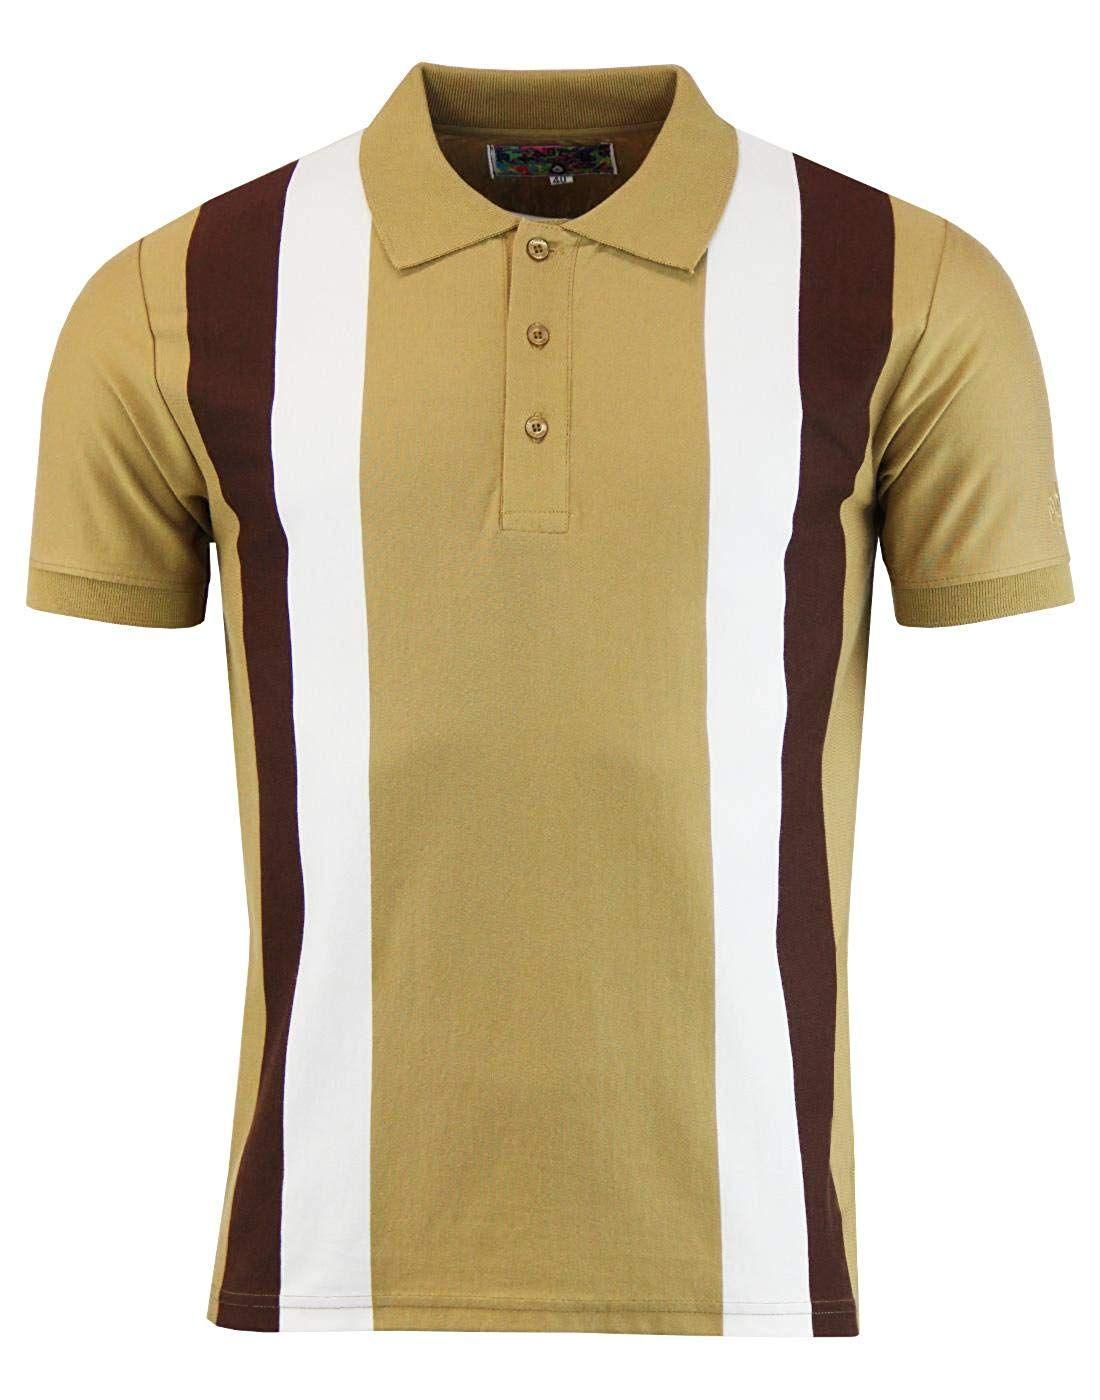 7baa363dff2613 Men's Vintage Style Shirts Madcap England Moody Mens 60s Mod Stripe Panel  Polo in Caramel